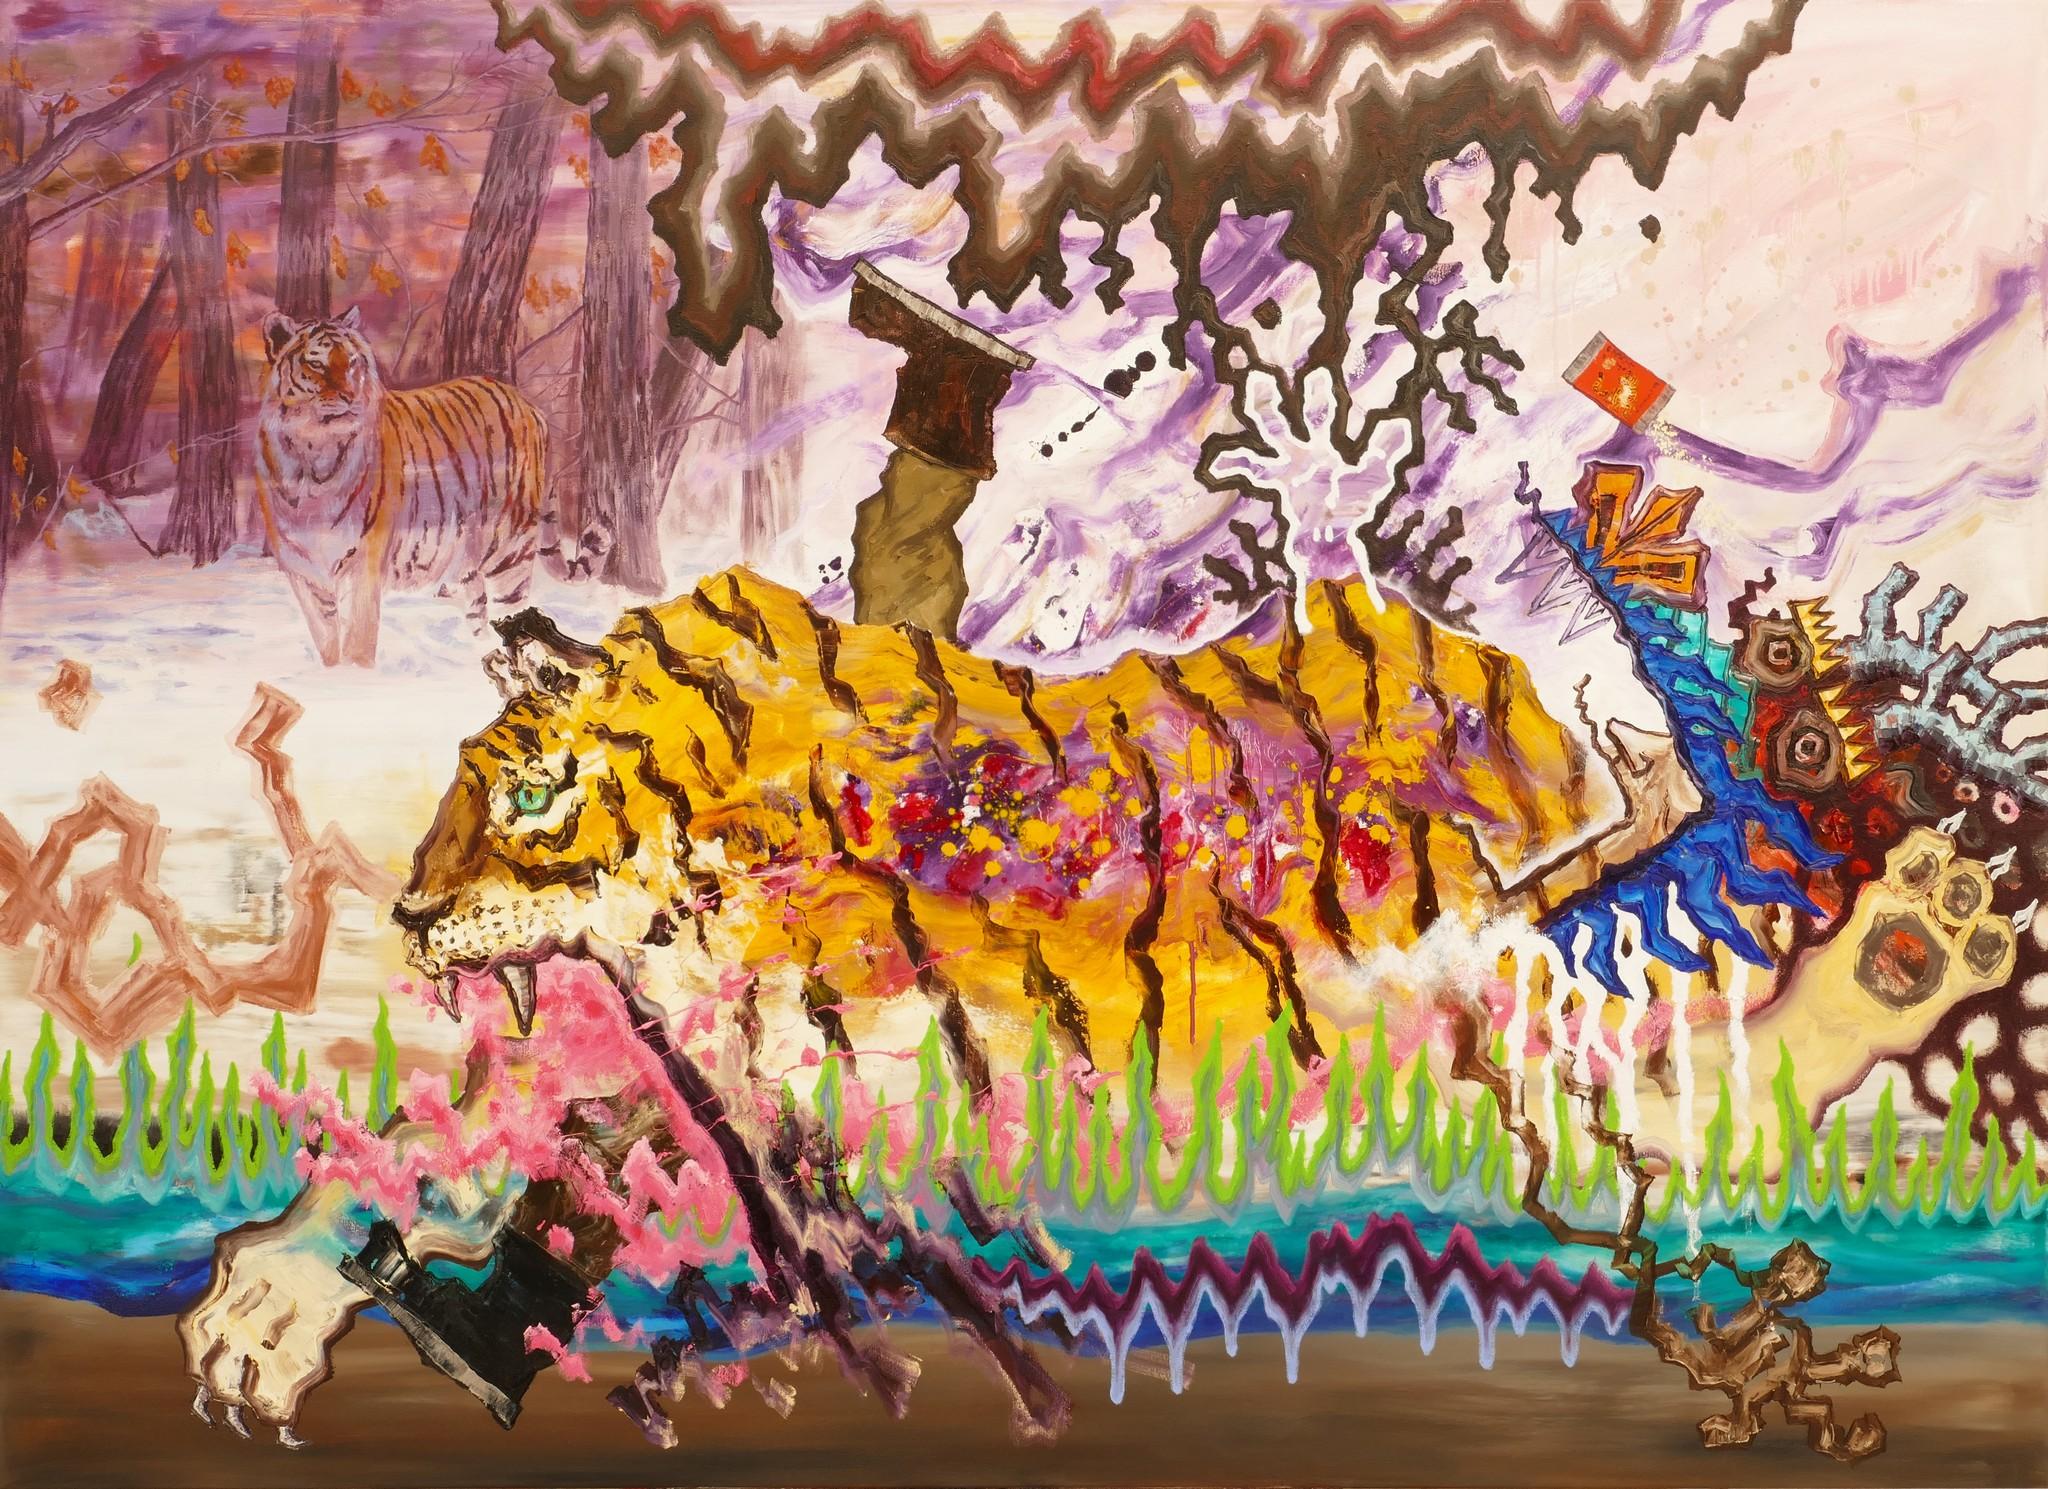 B, Tiger ohne Wirkung, 130x180cm, 2019